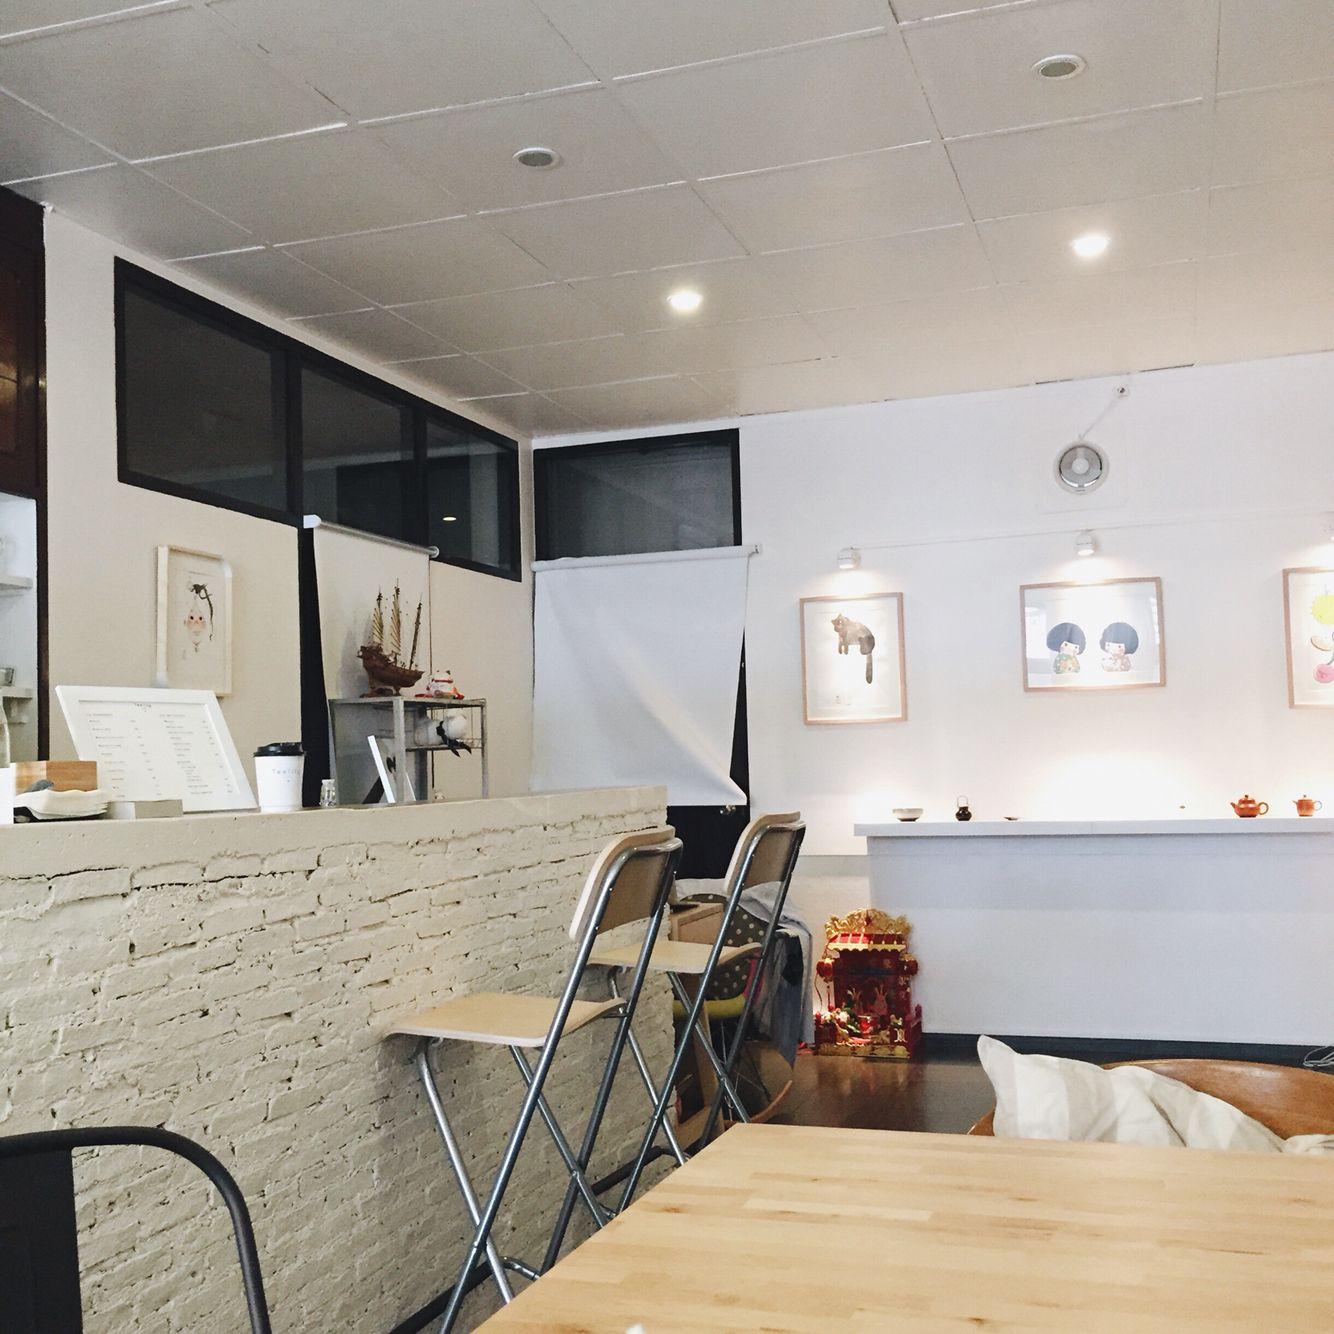 Tealily Cafe Bangkok | Thailand | VASEJINCAFE | Pinterest | Bangkok ...